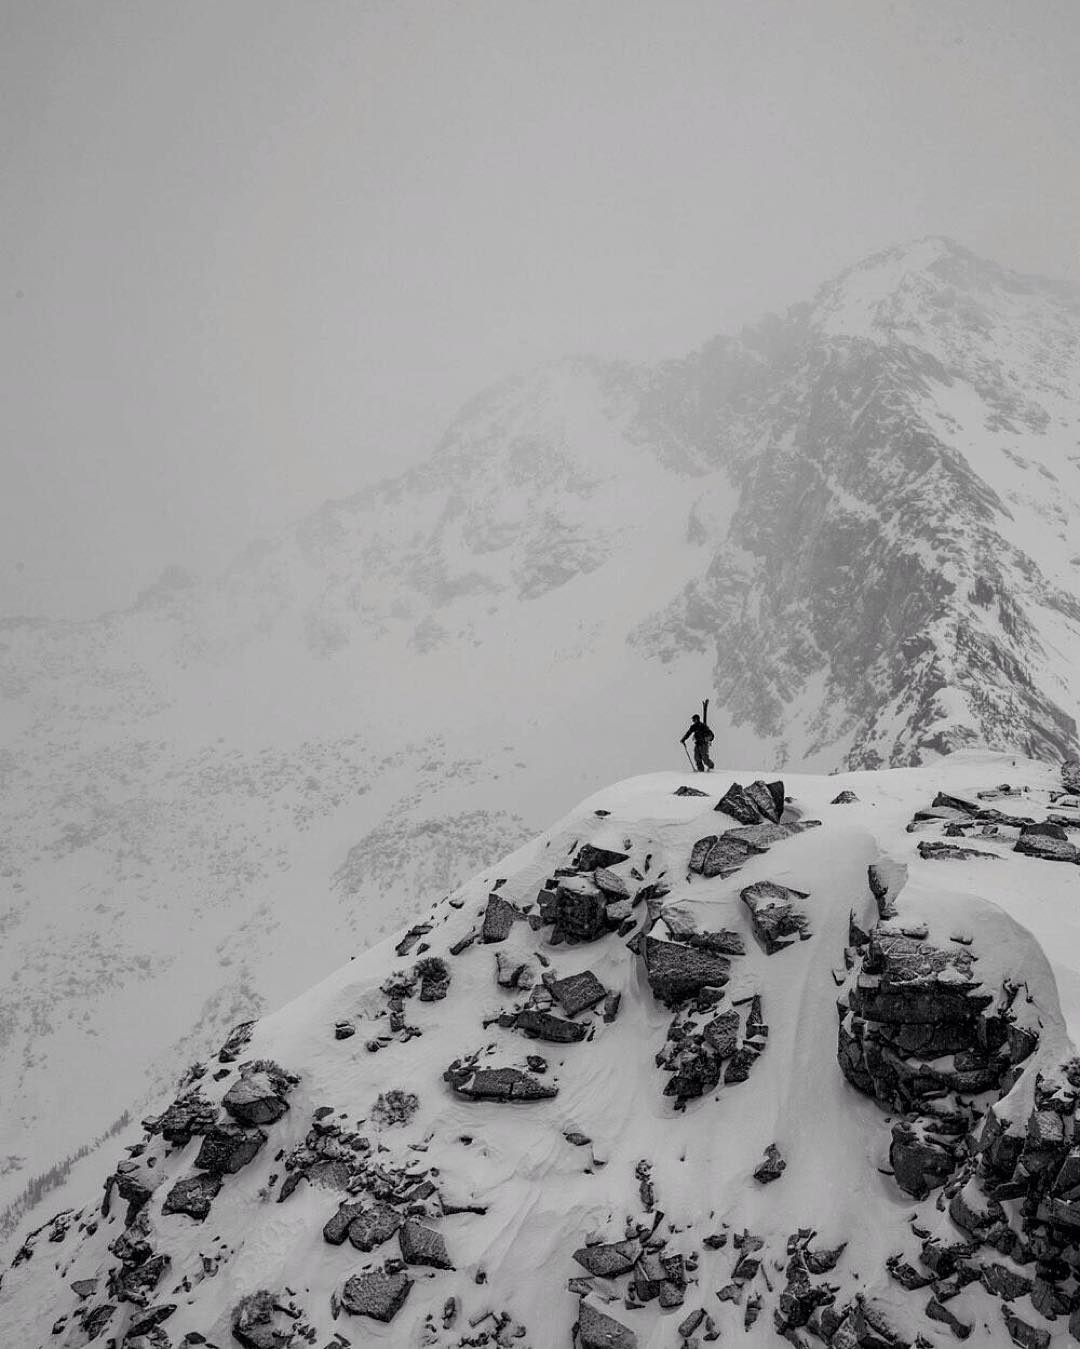 Baggin Peaks Since '05  #flylowgear | #embracethestorm  P. @acpictures